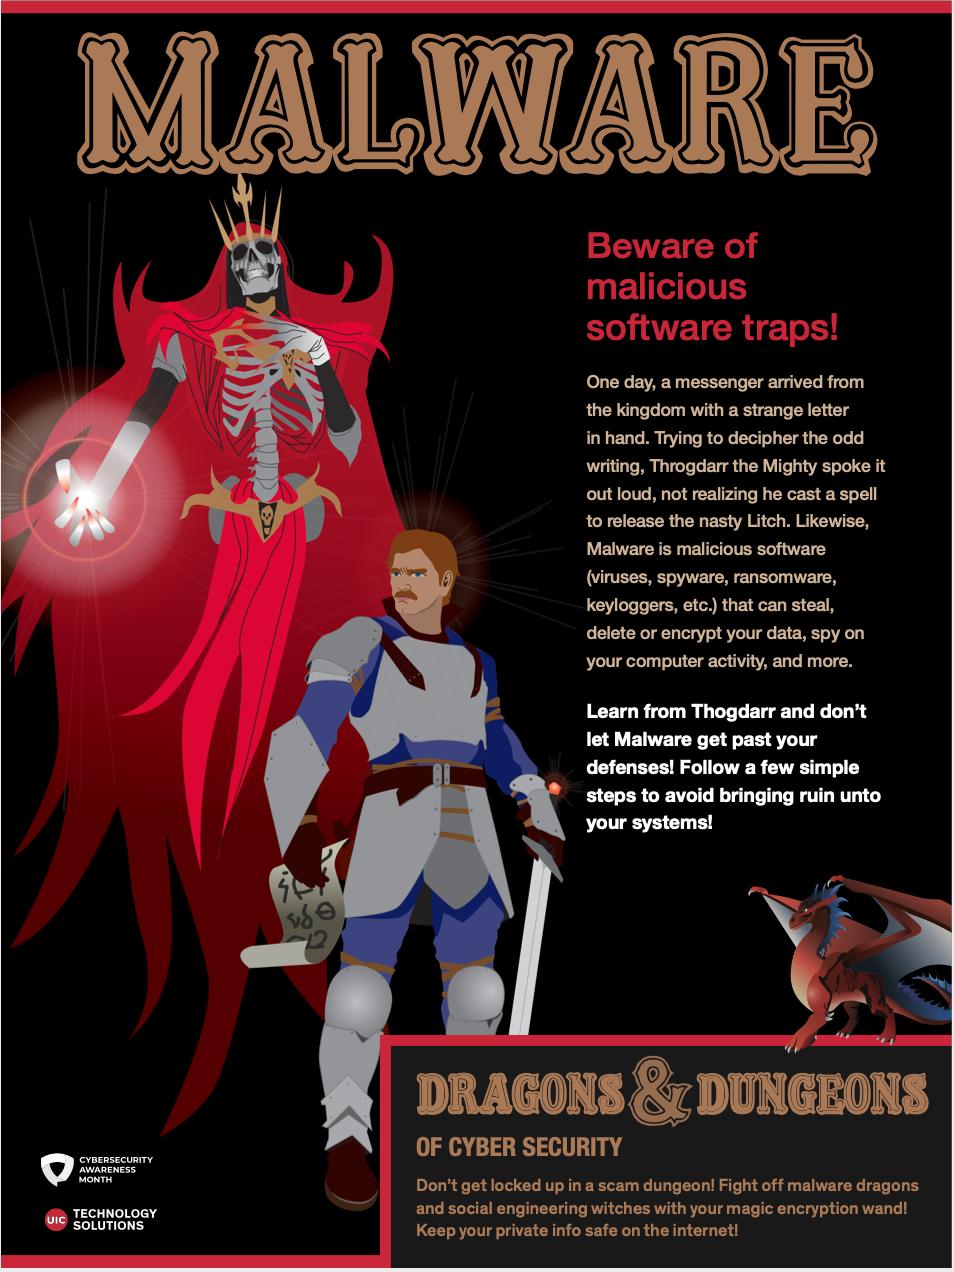 Malware: Beware of malicious software traps!